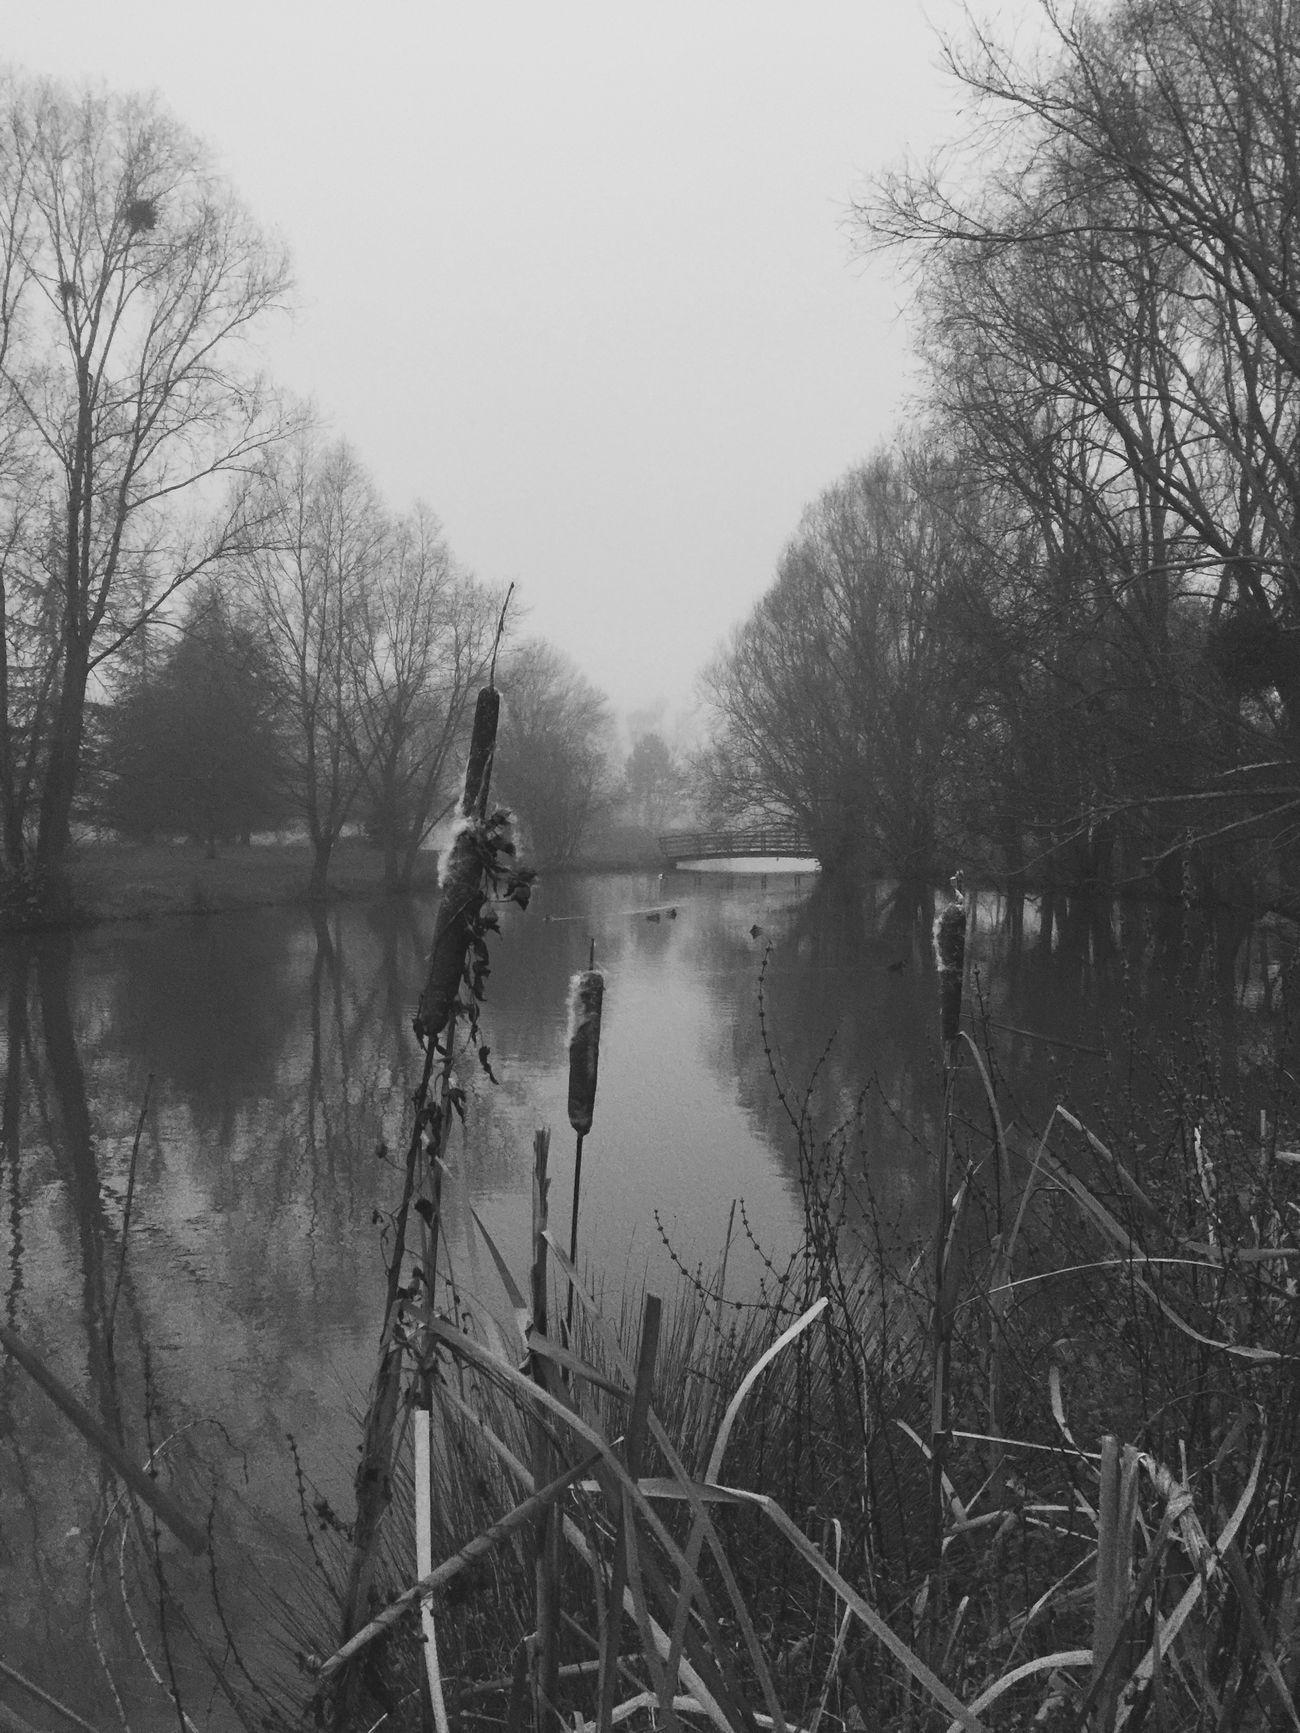 Fog Foggy Foggy Day Brouillard Brume Lac Seine Et Marne Landscape Nature Paysage 77 Lake Etangs Reflection Iphone6plus IPhoneography Beautiful Sky